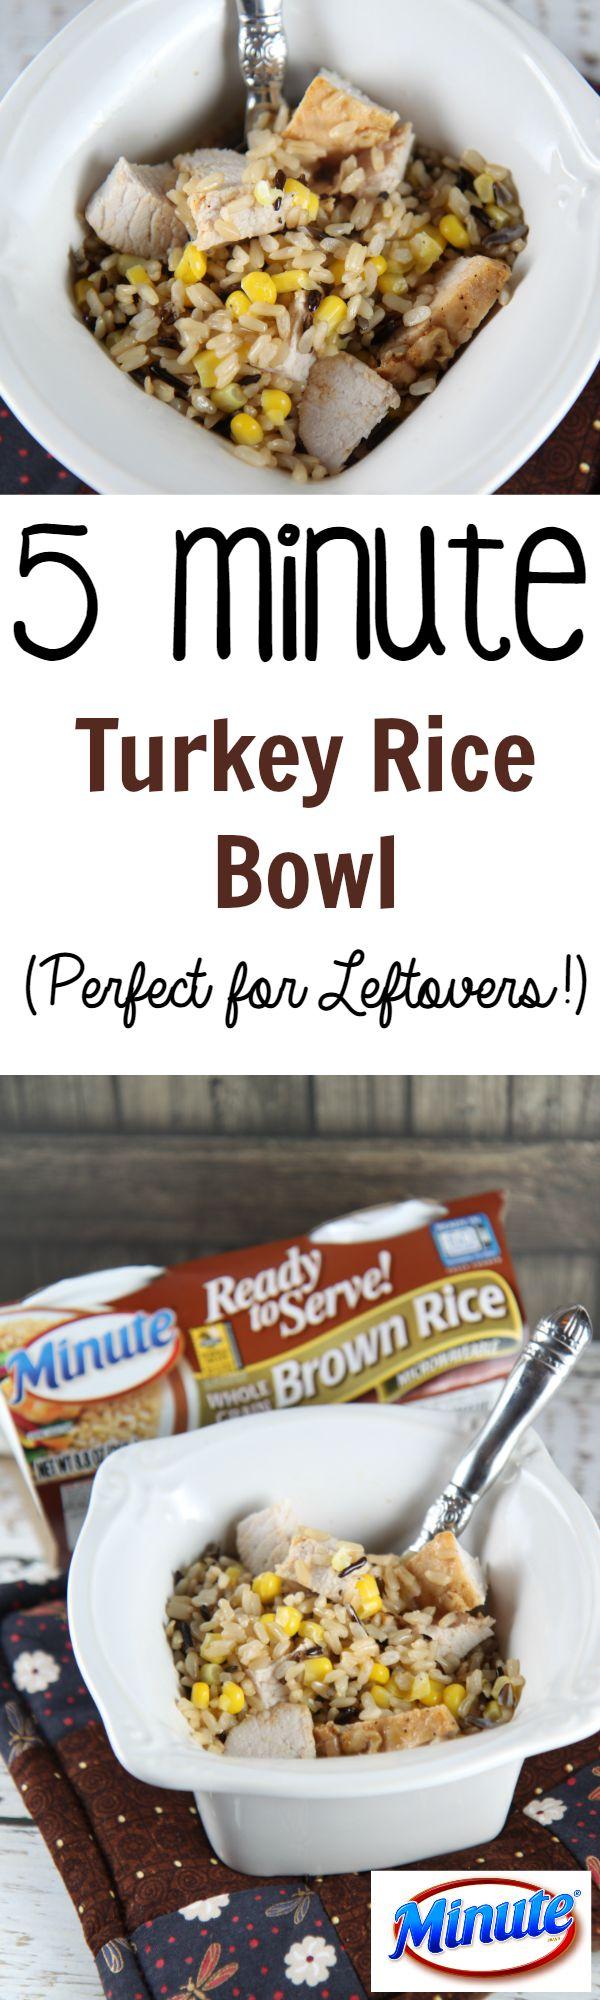 5 Minute turkey Rice Bowl